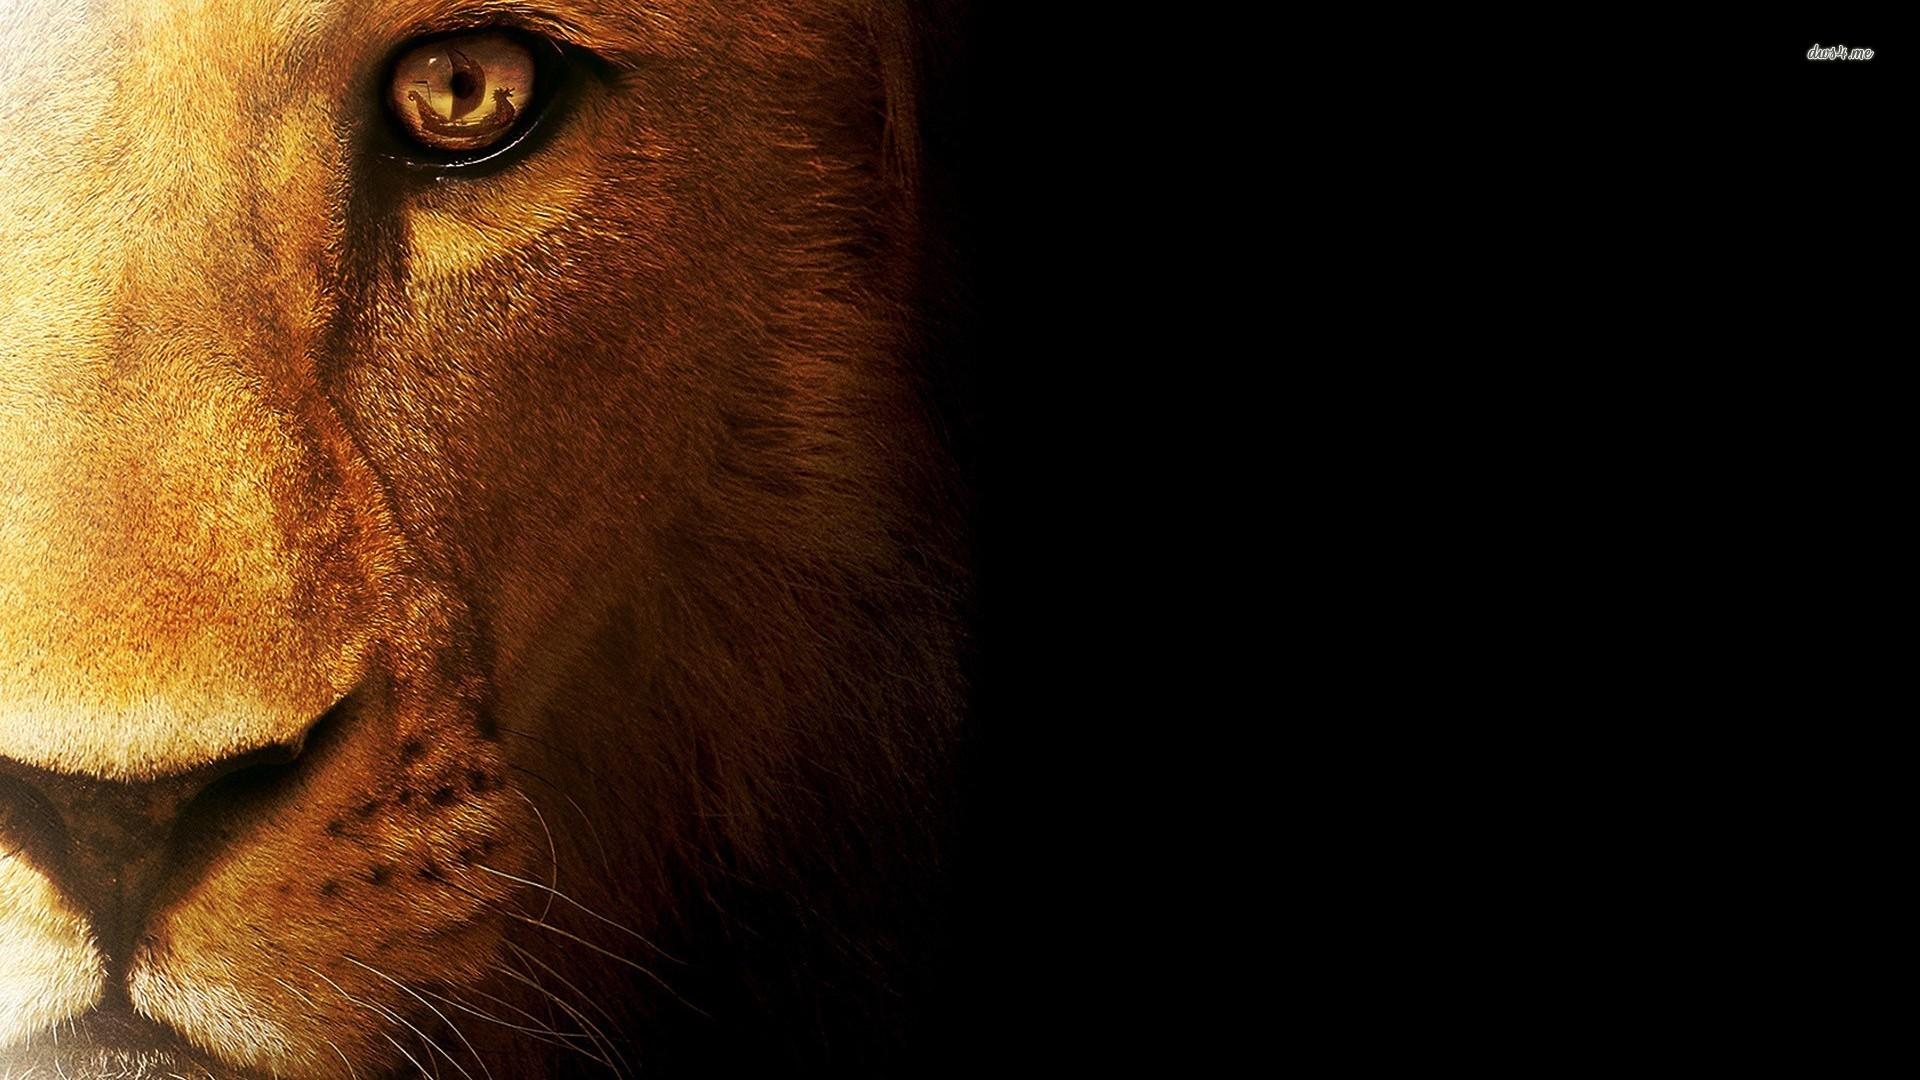 Lion Wallpapers Images Data-src - Hd ...